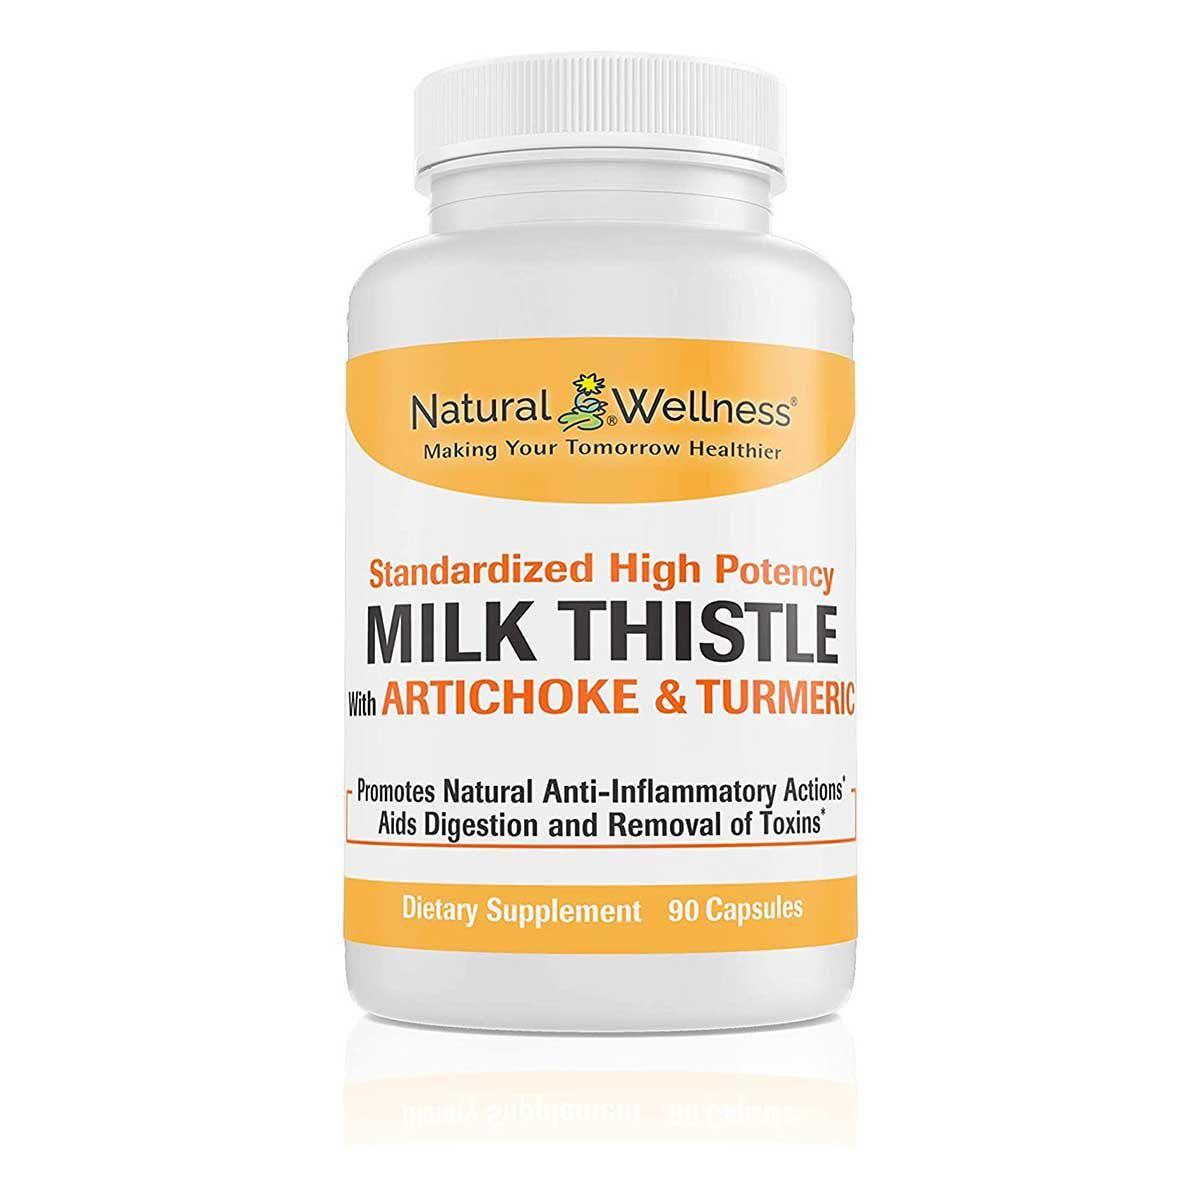 natural wellness milk thistle artichoke and turmeric